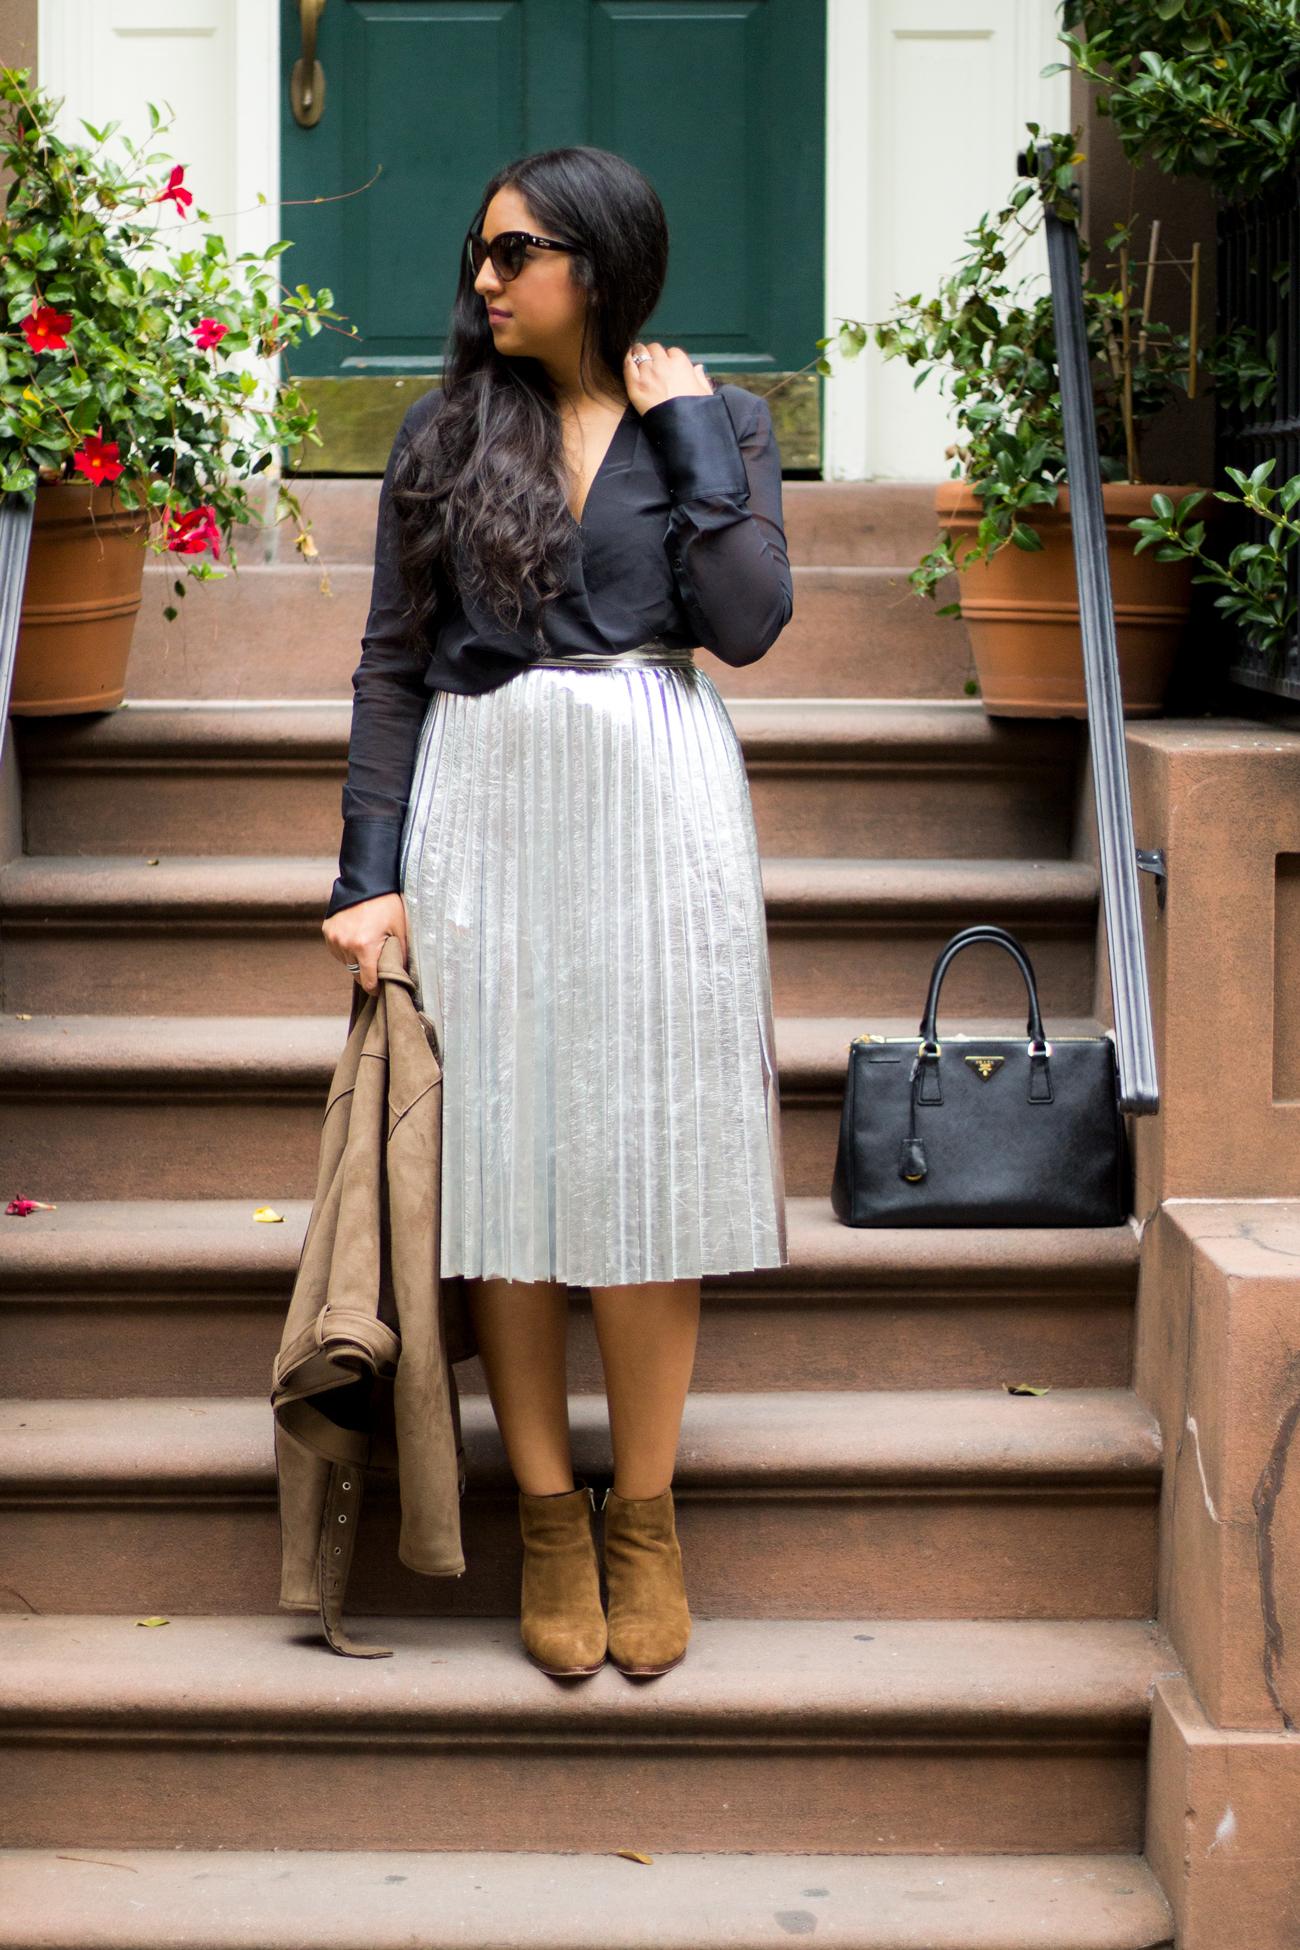 silver-skirt-moto-jacket